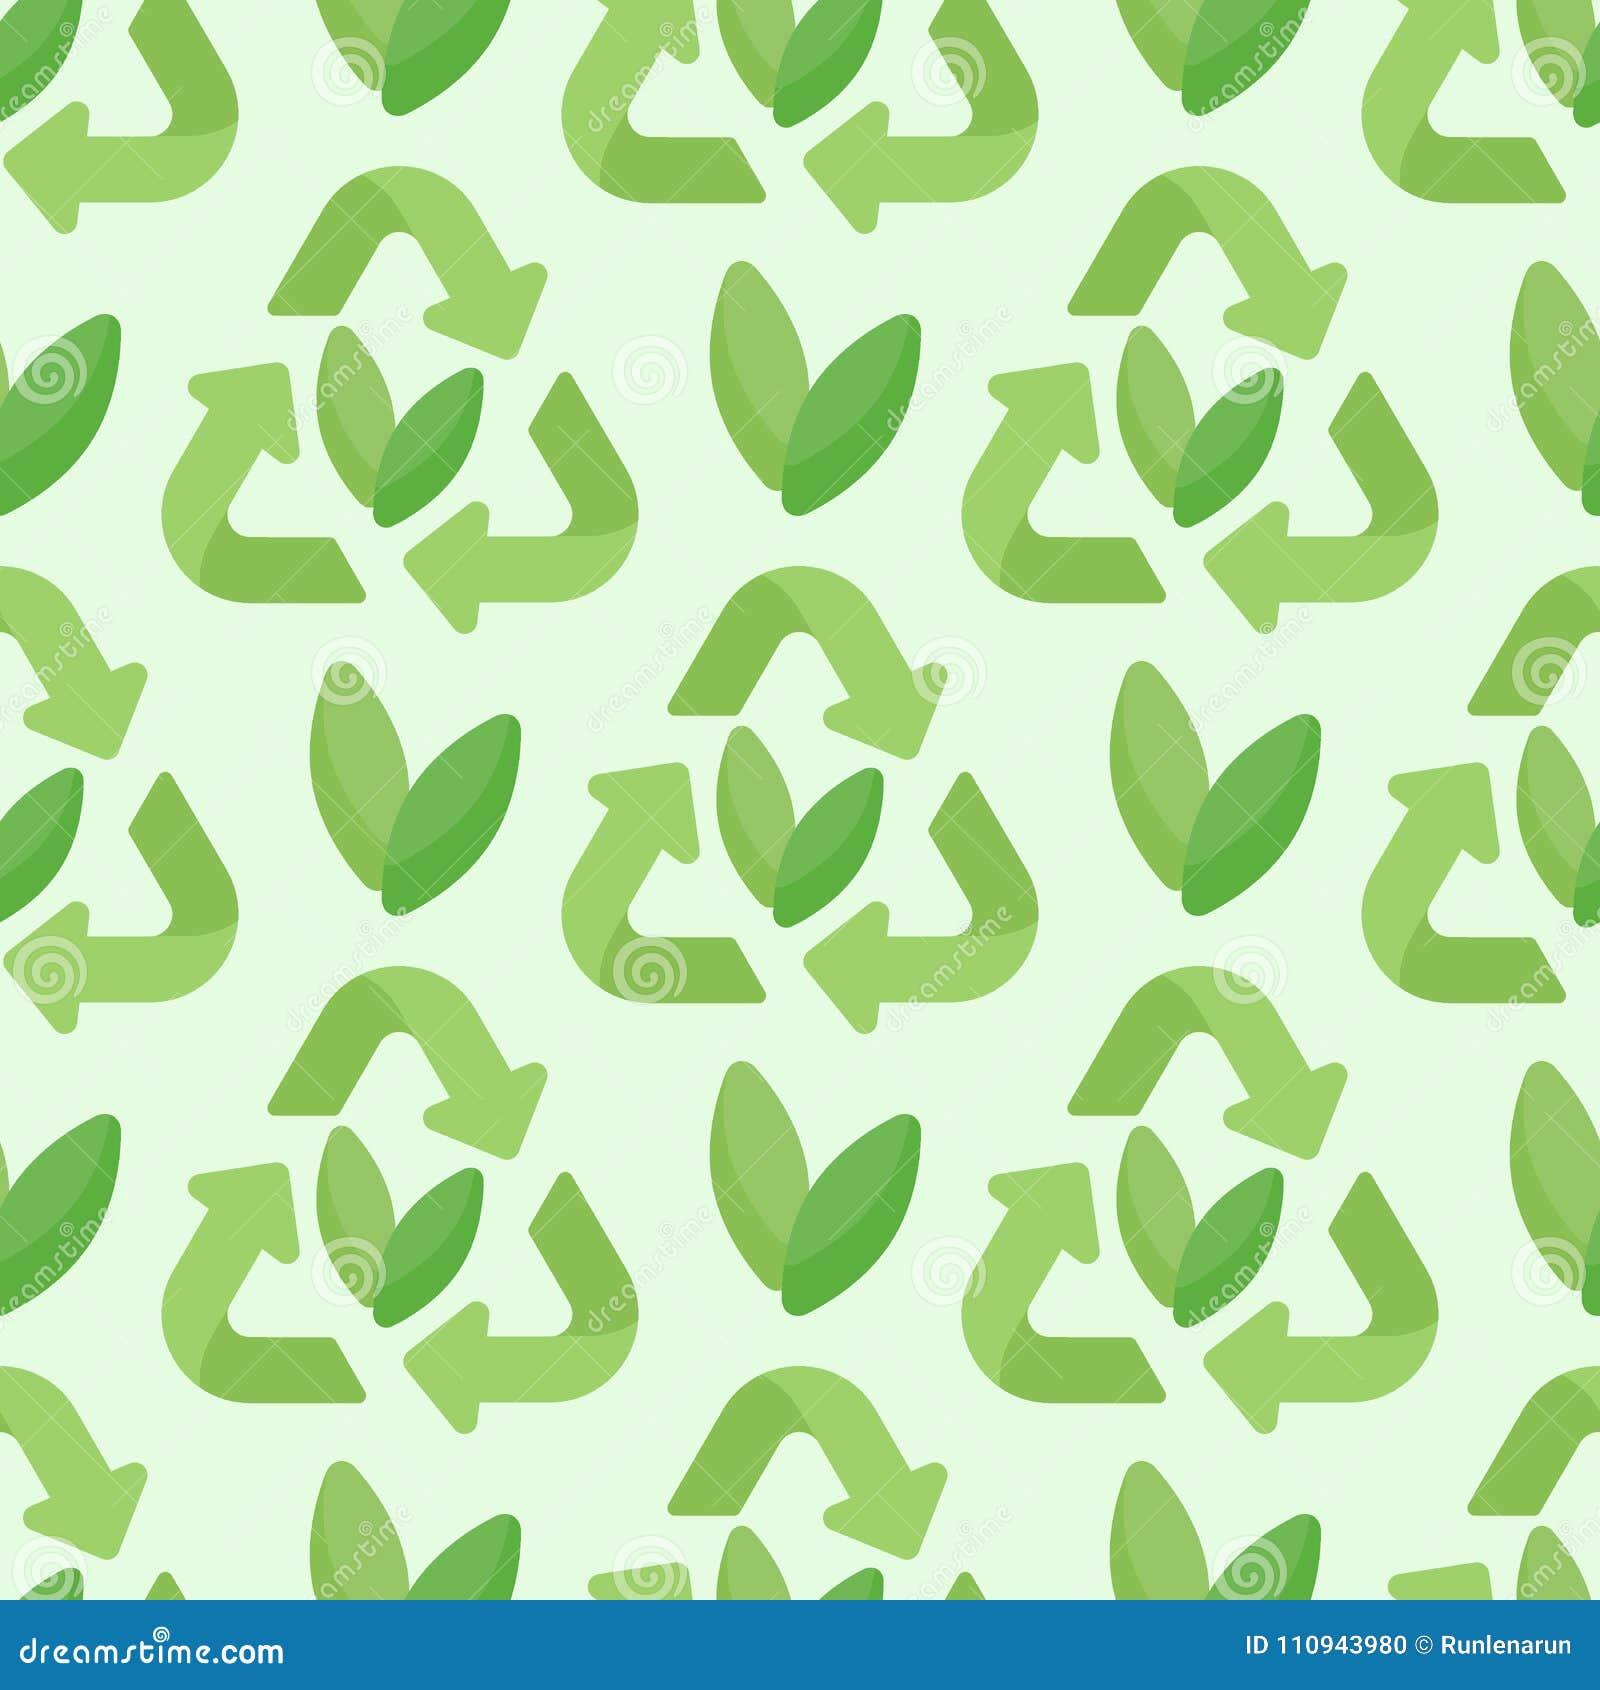 Sustainable Packaging Vector Seamless Pattern Stock Illustration